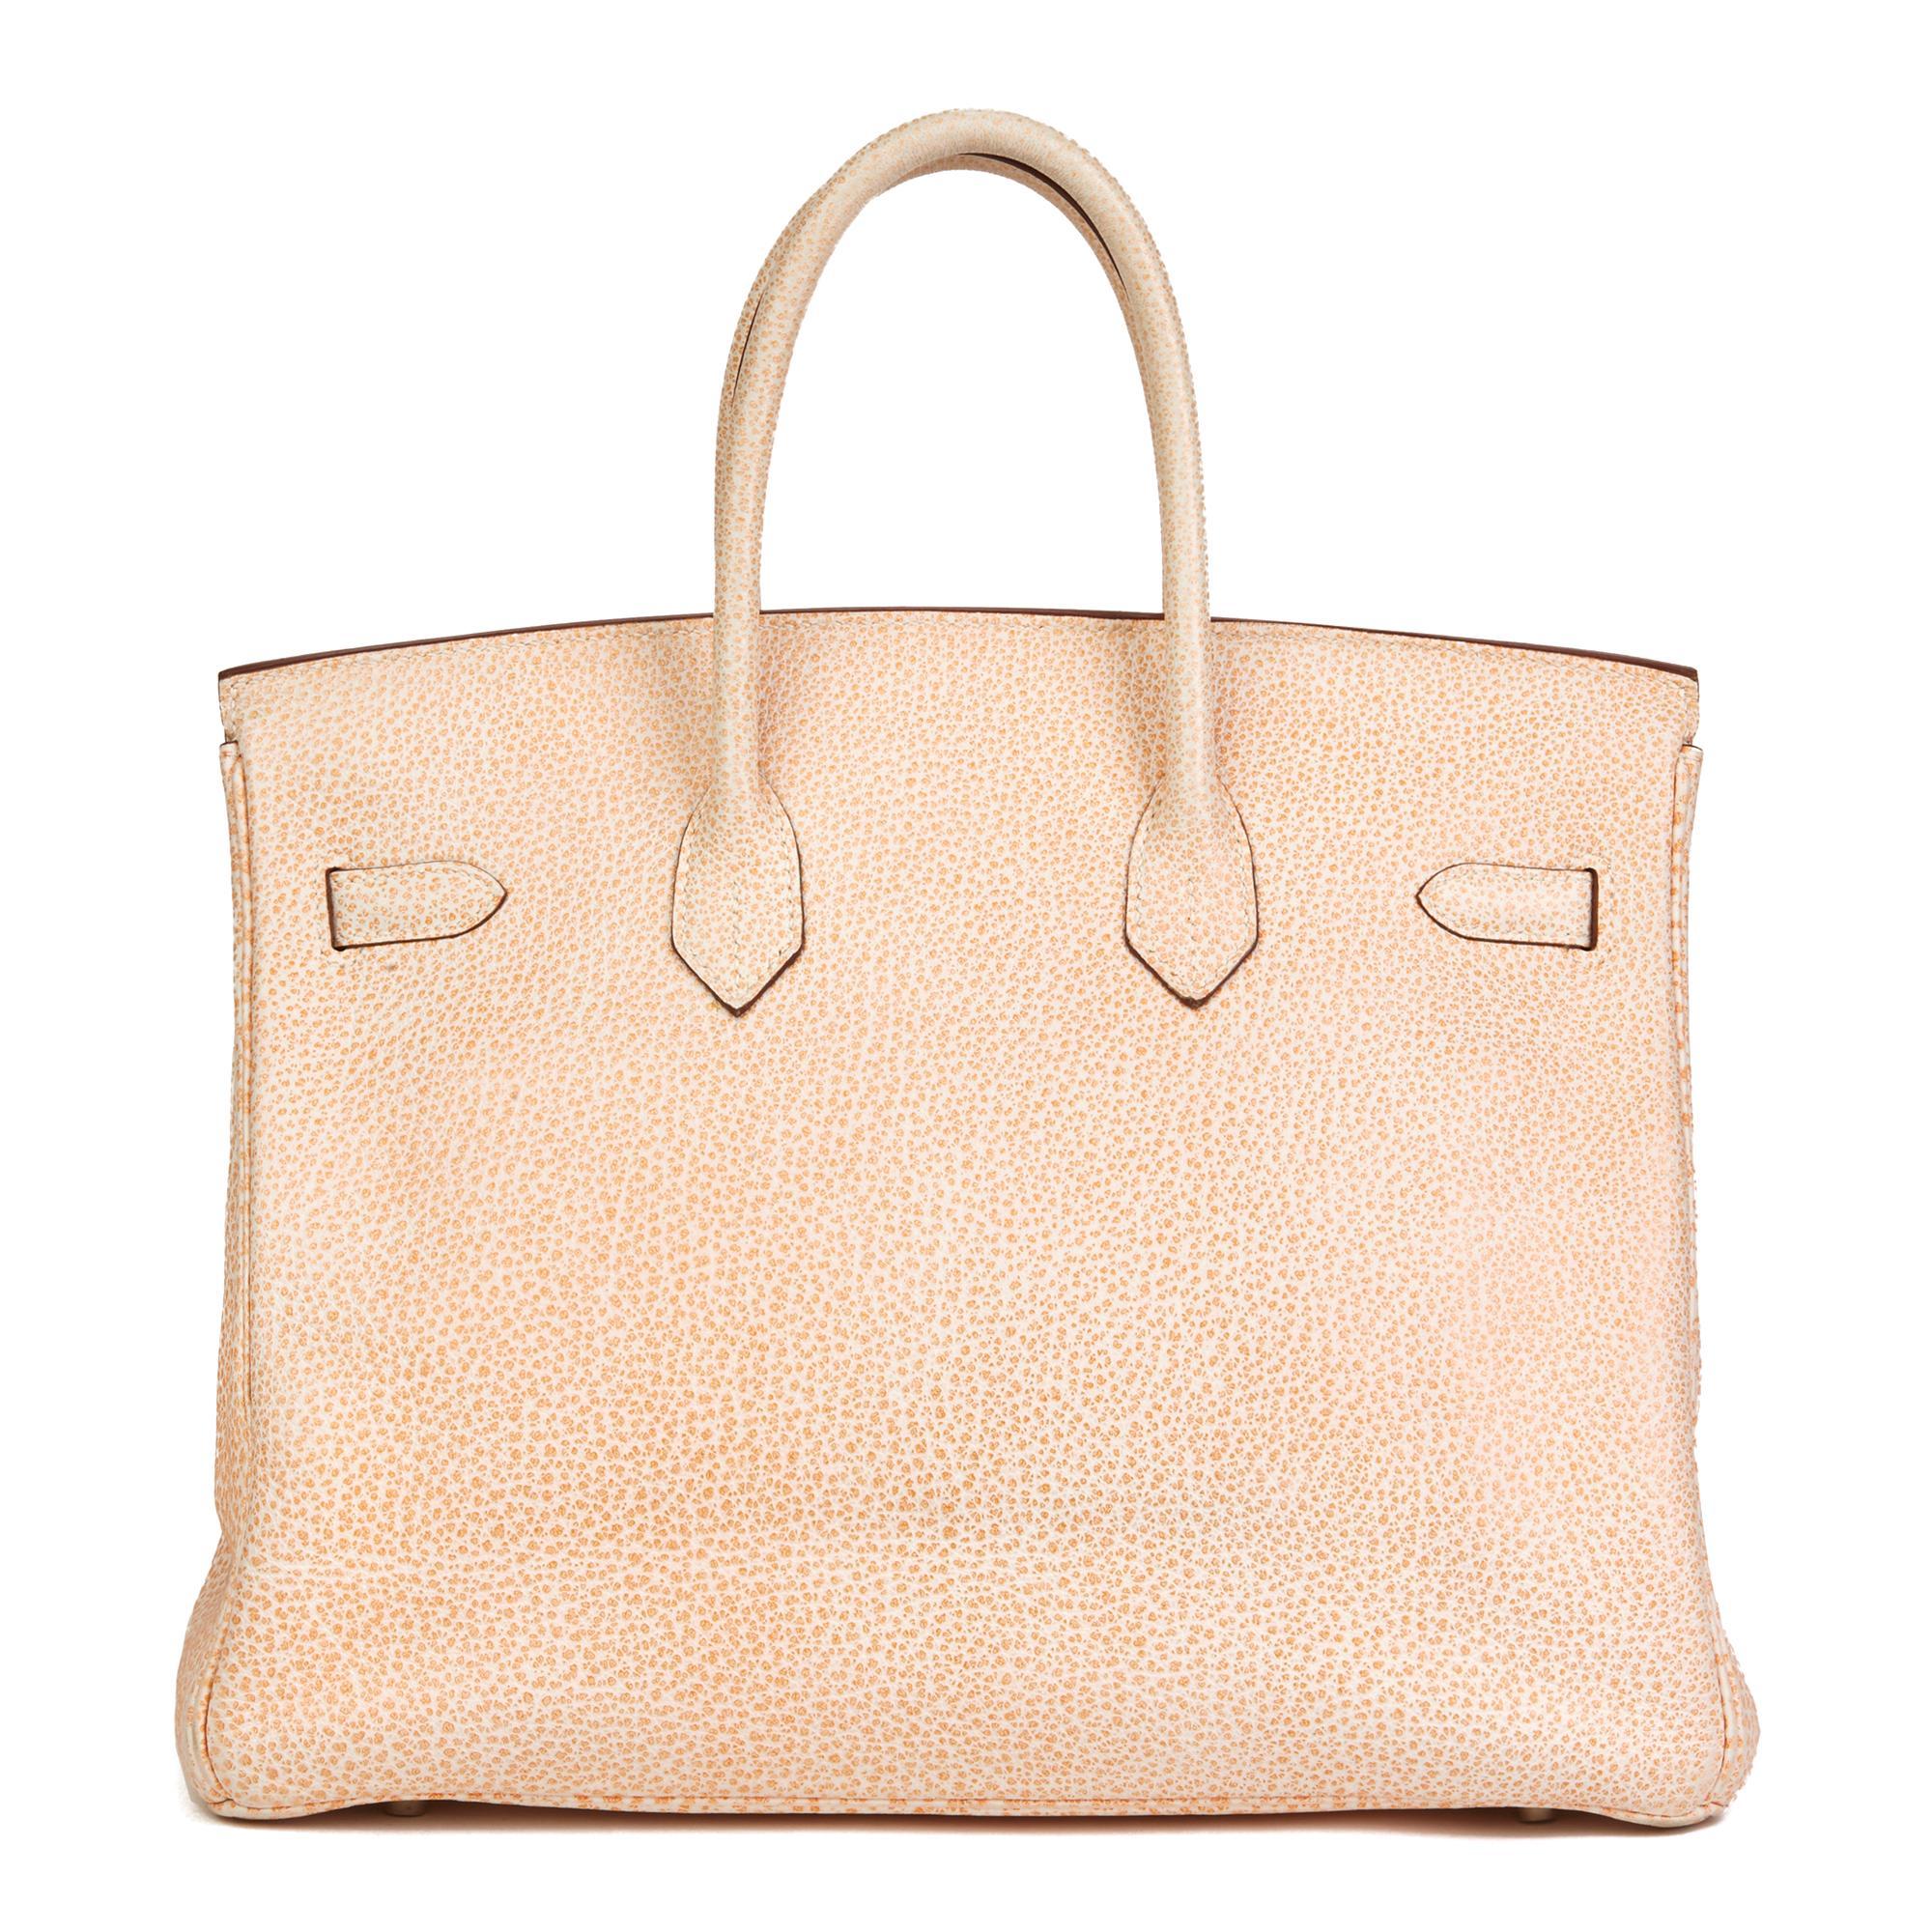 859b6f0aa16 2002 Hermes Orange Dalmation Buffalo Leather Birkin 35cm For Sale at 1stdibs